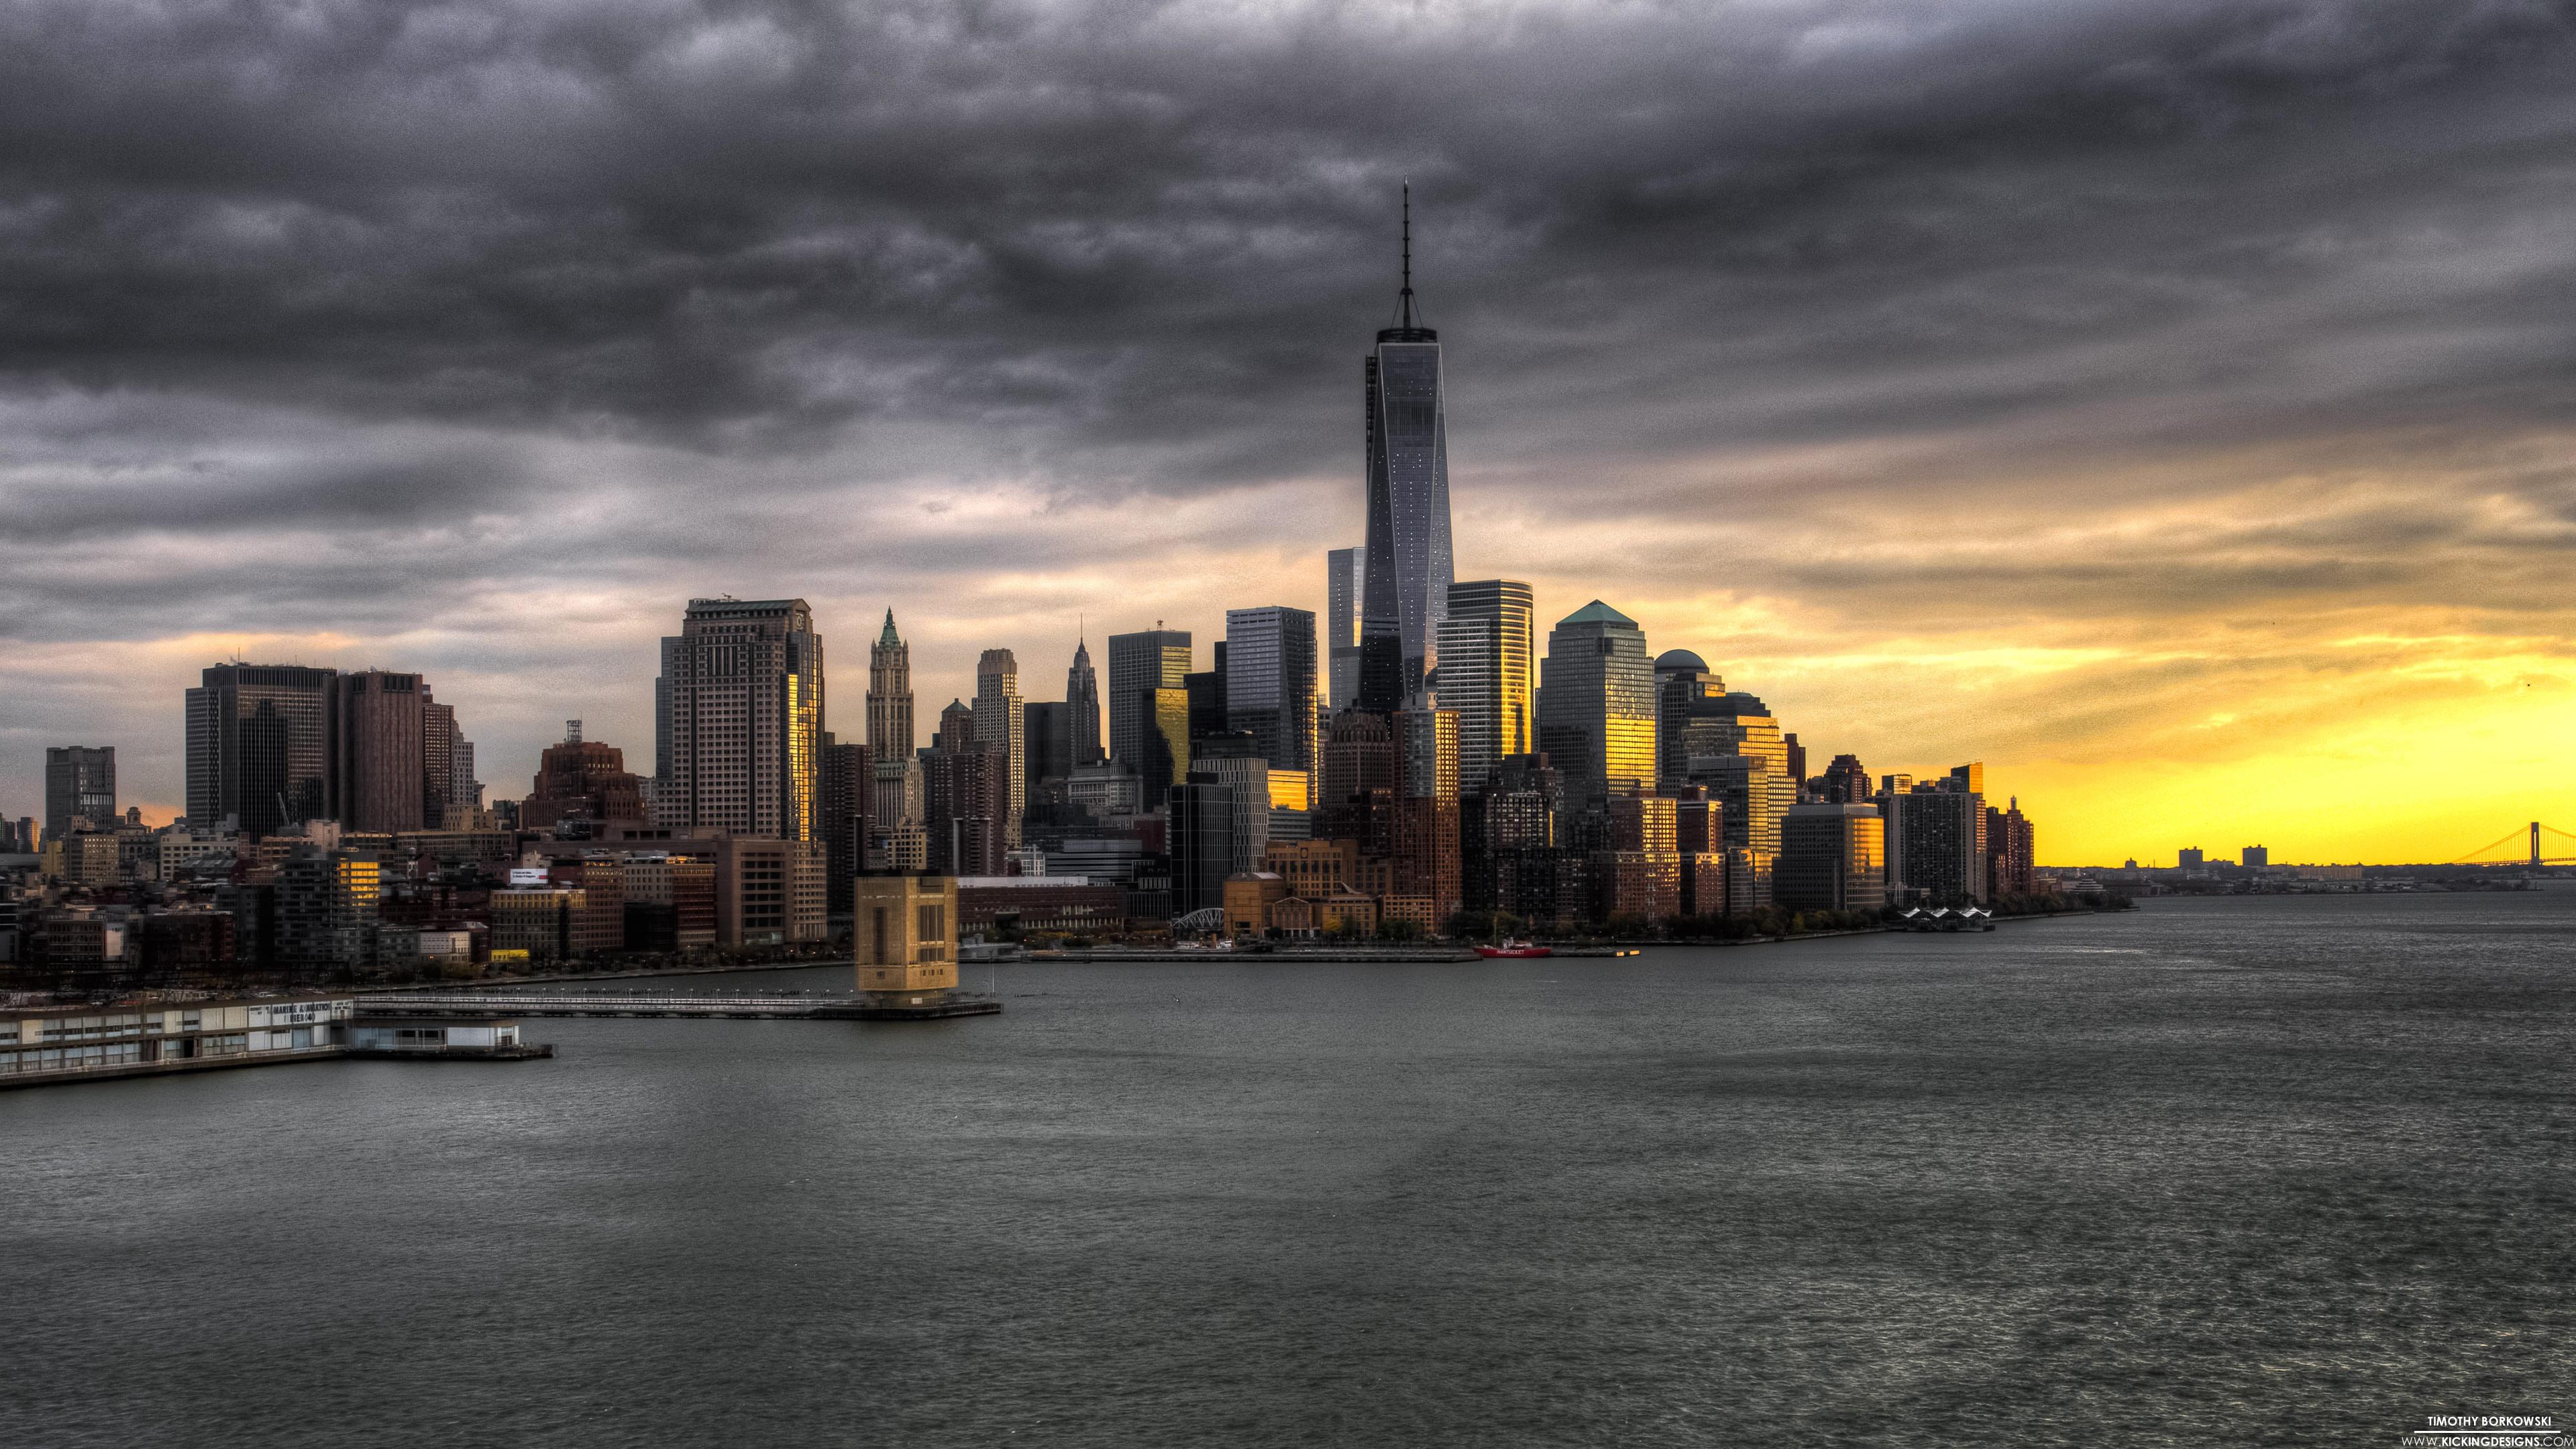 страны город архитектура Манхеттен США на телефон